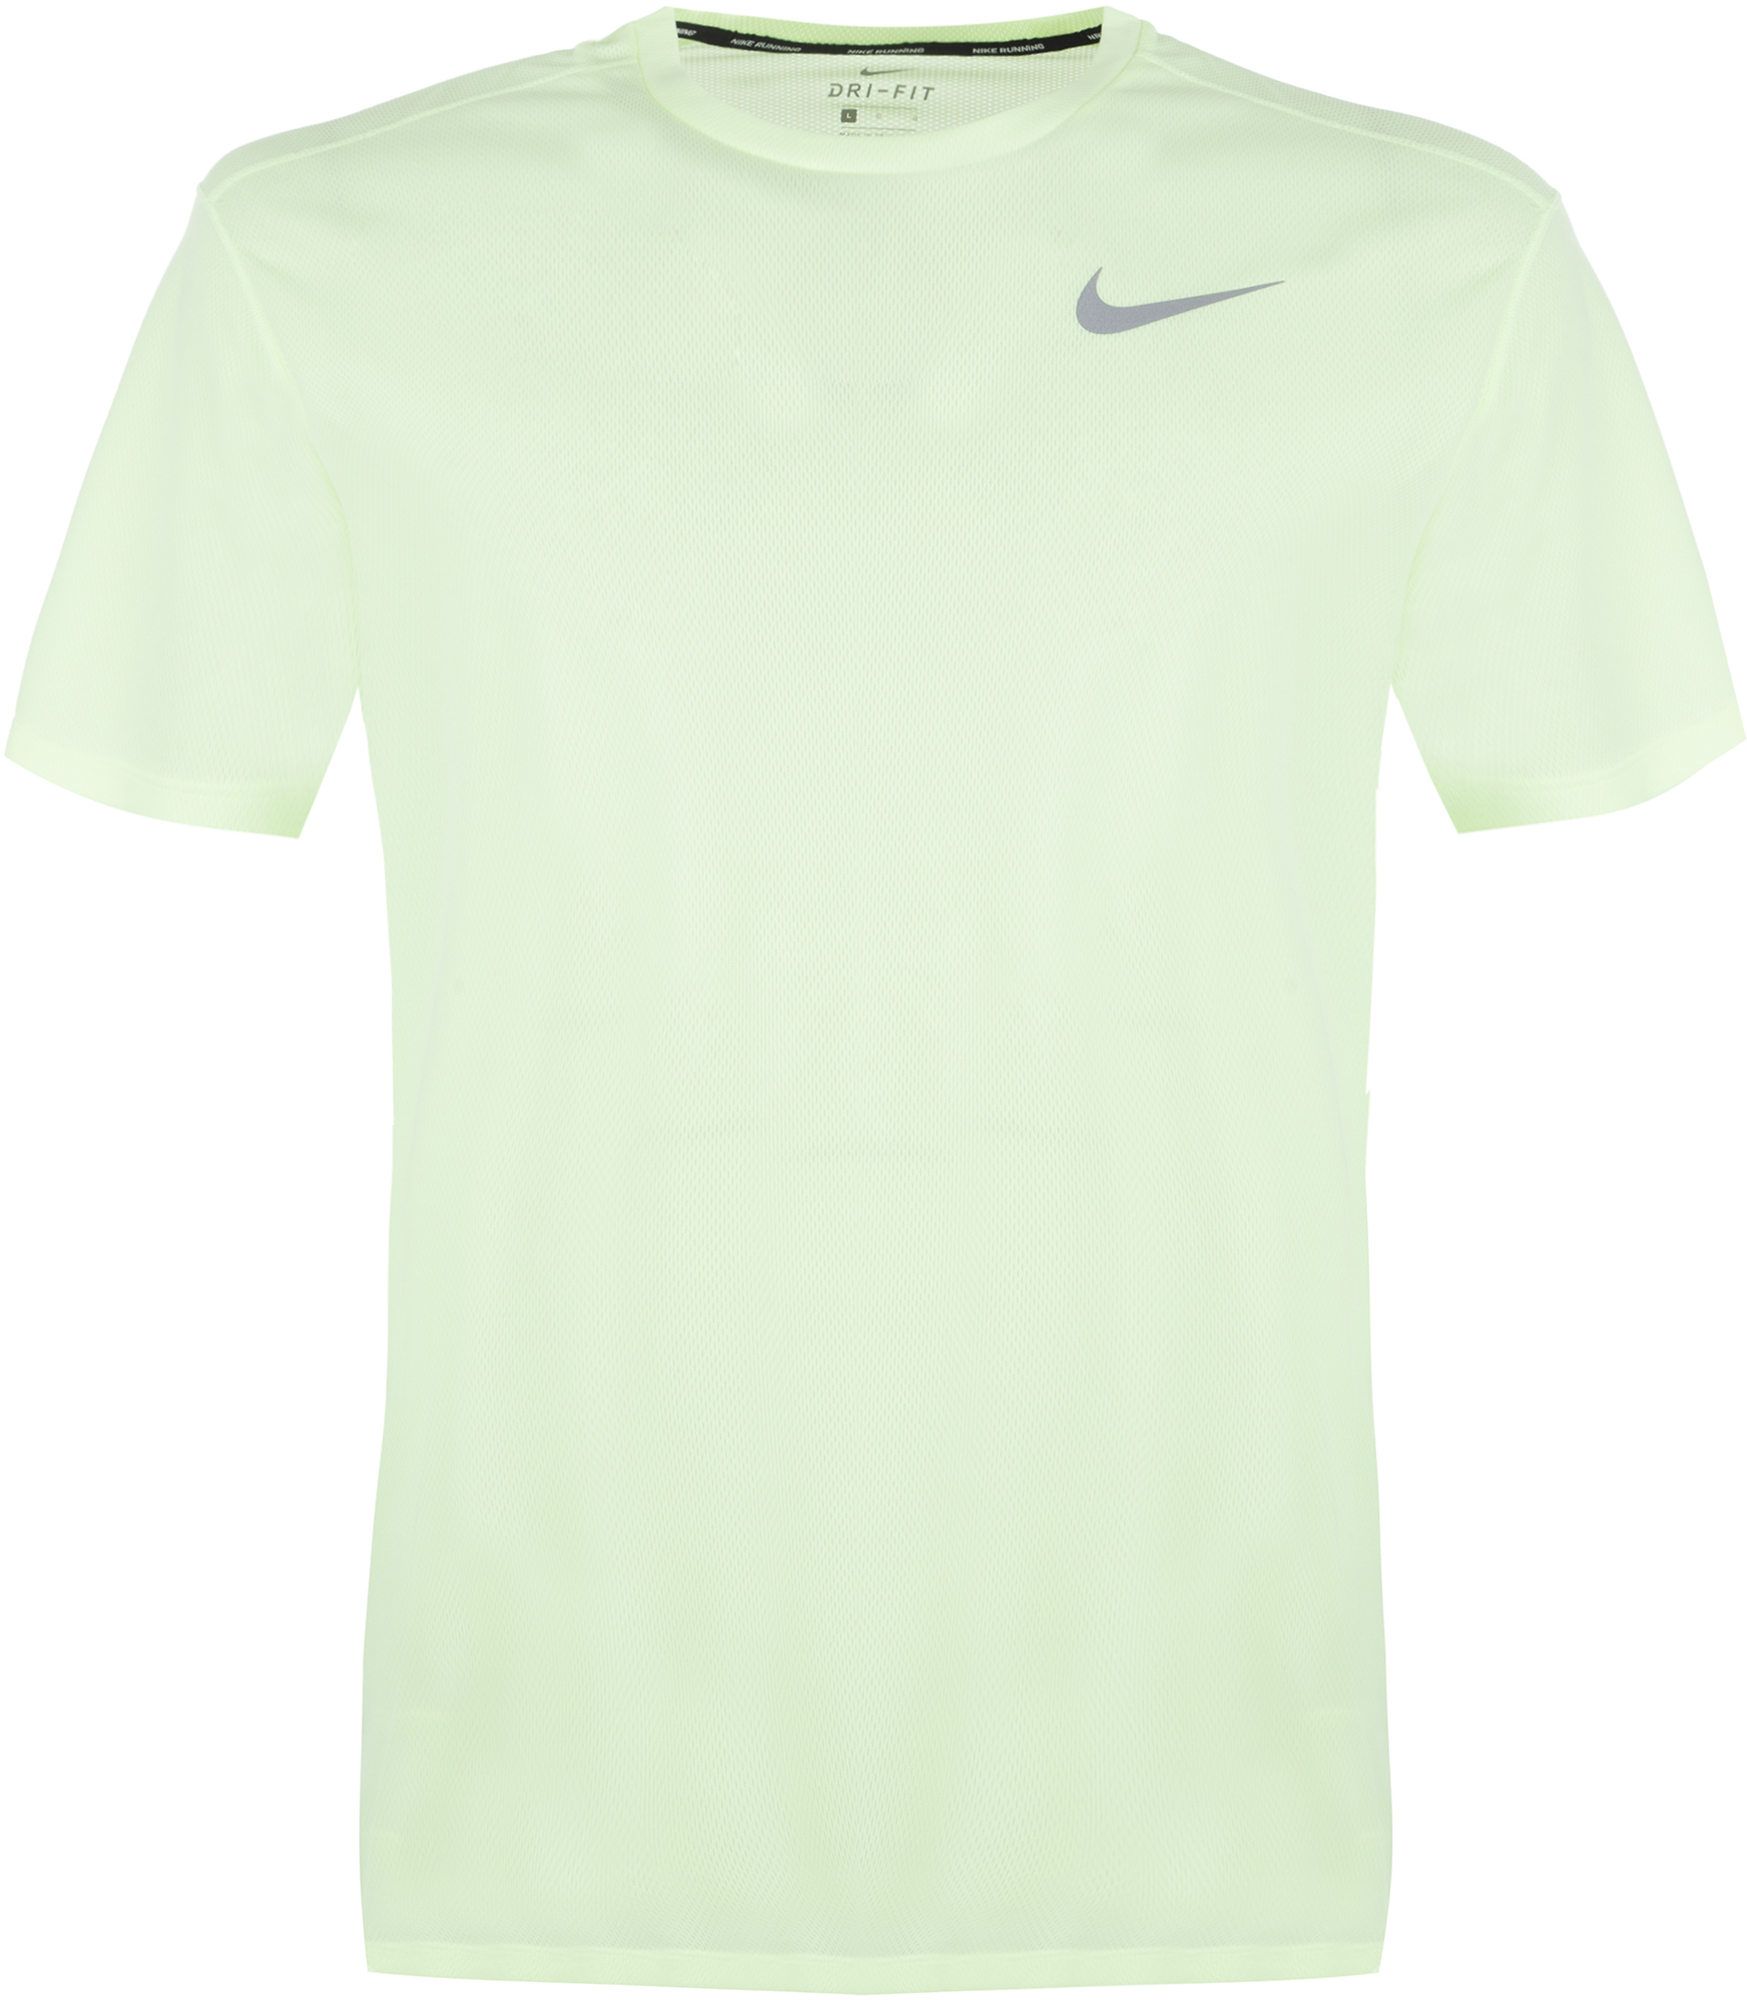 Nike Футболка мужская Nike Breathe Run, размер 52-54